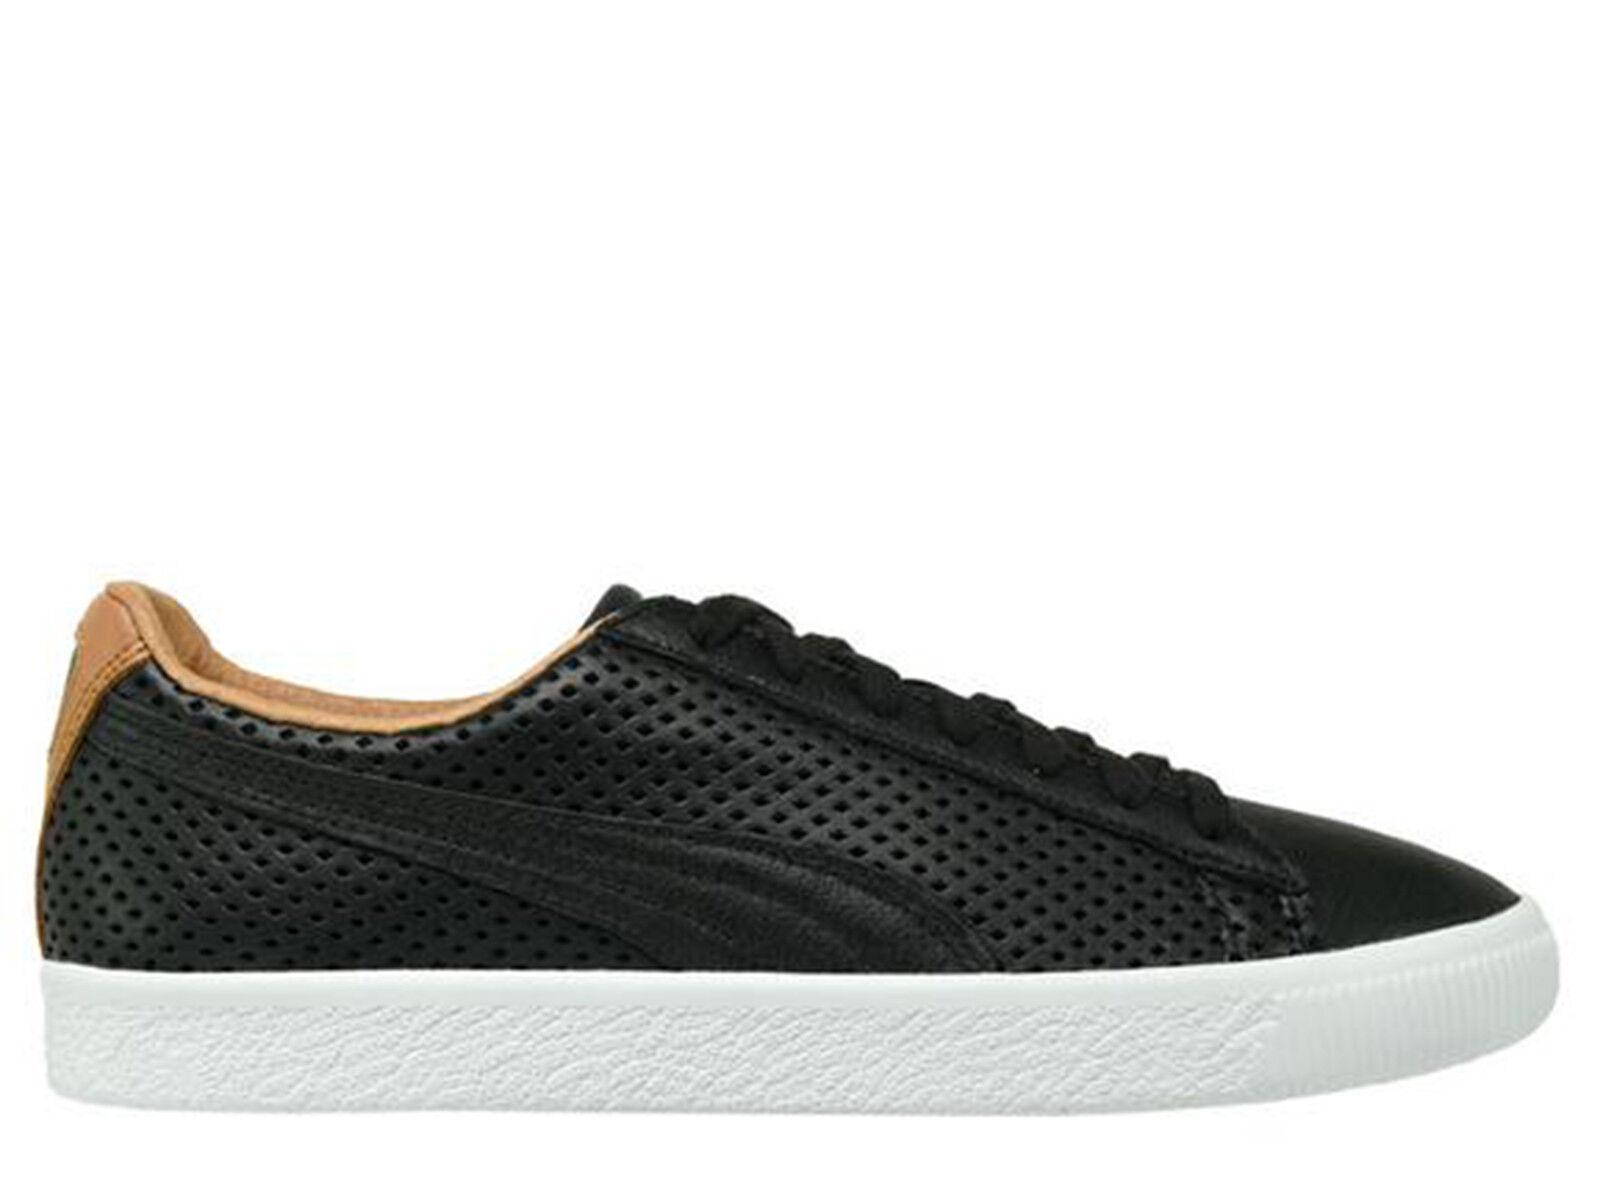 Brand New Puma Clyde Coloreeblock 2 Uomo Athletic Athletic Athletic Fashion scarpe da ginnastica [363833 02] 19d3bc